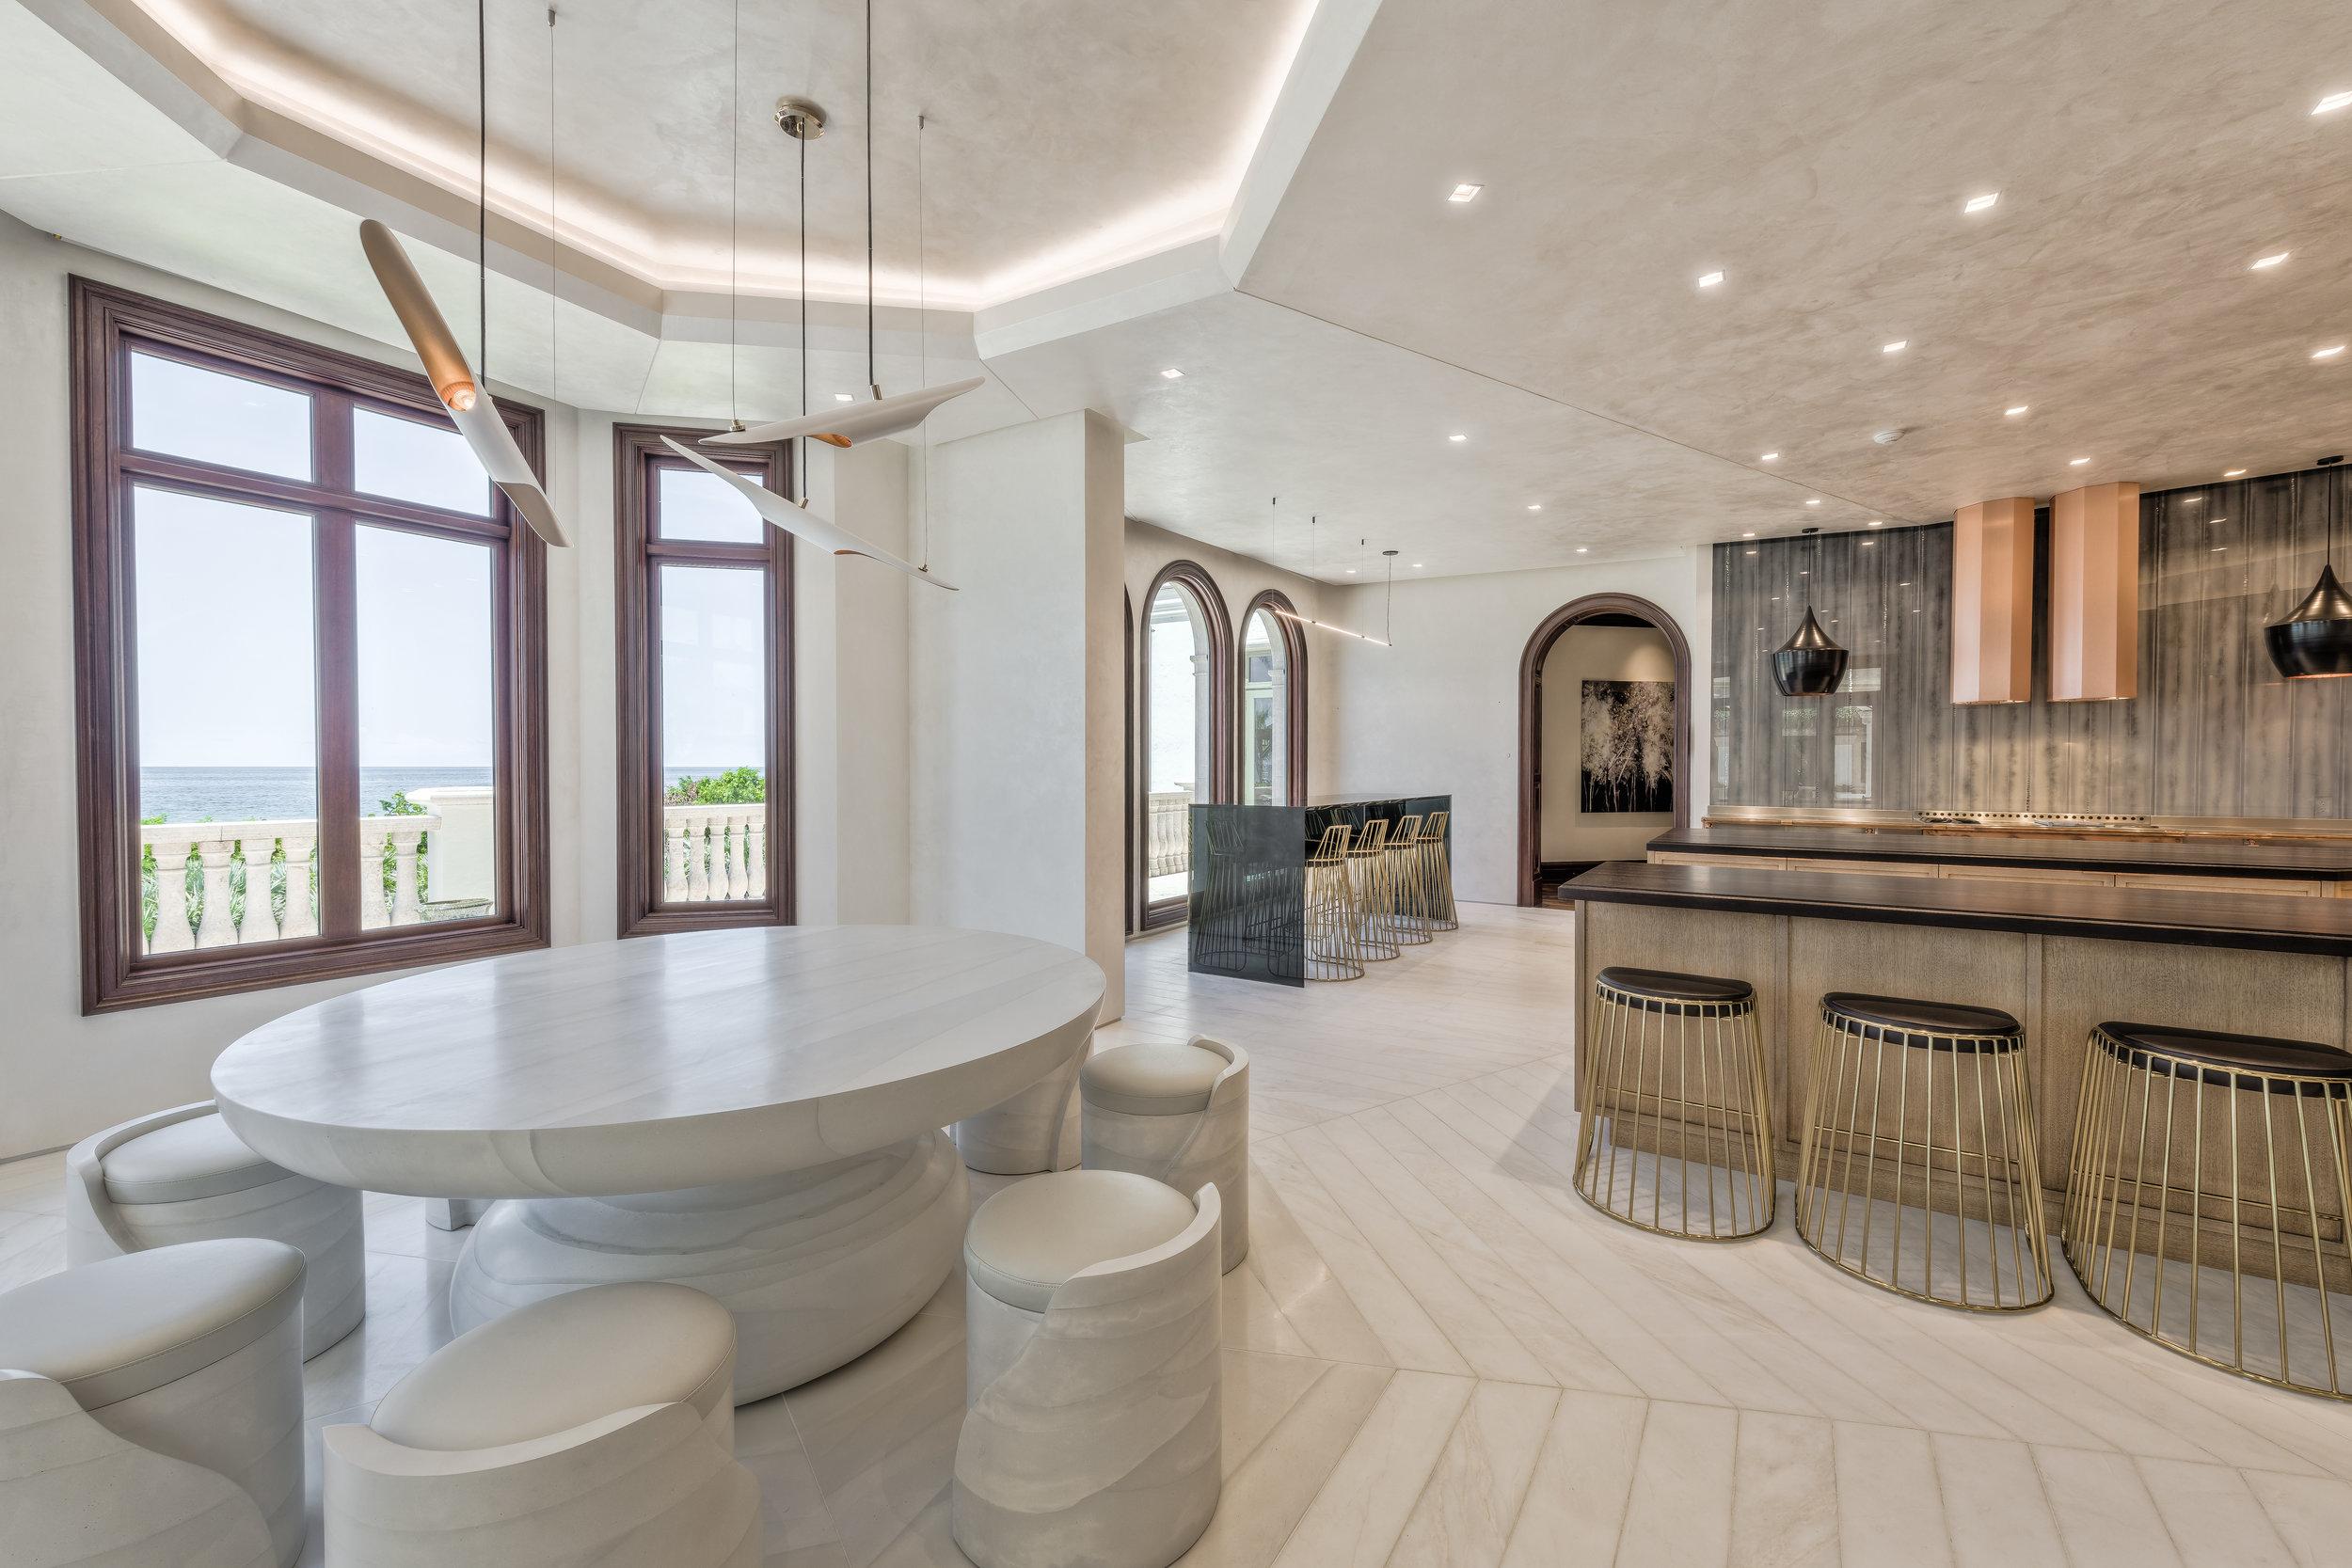 Private Beachfront Estate Kitchen Nook